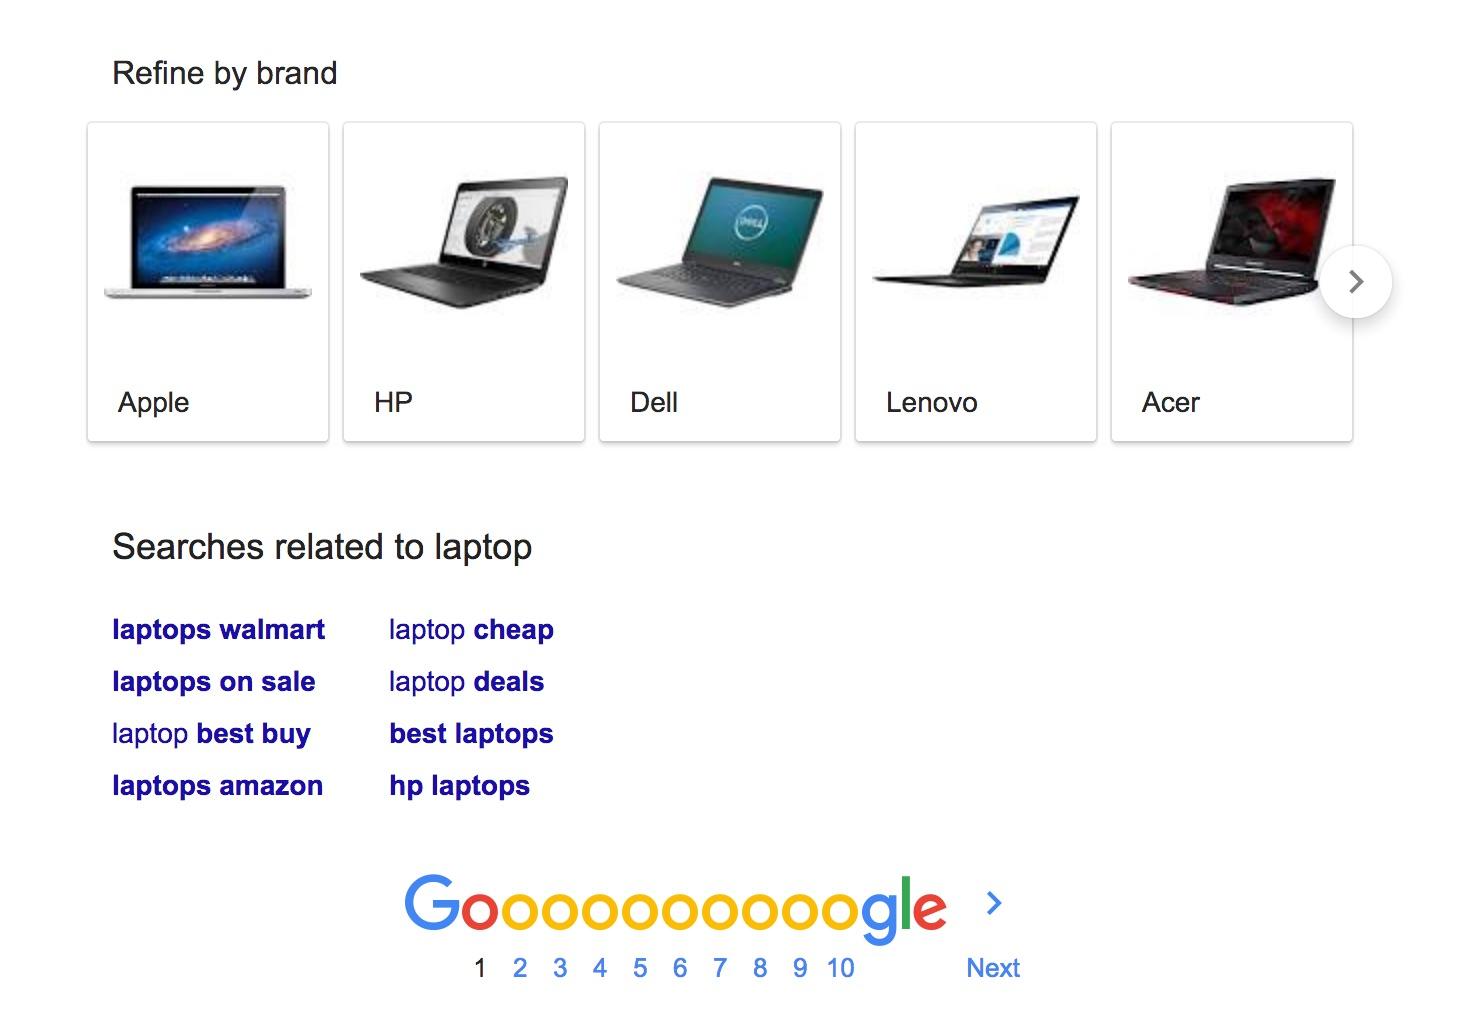 搜尋 laptop